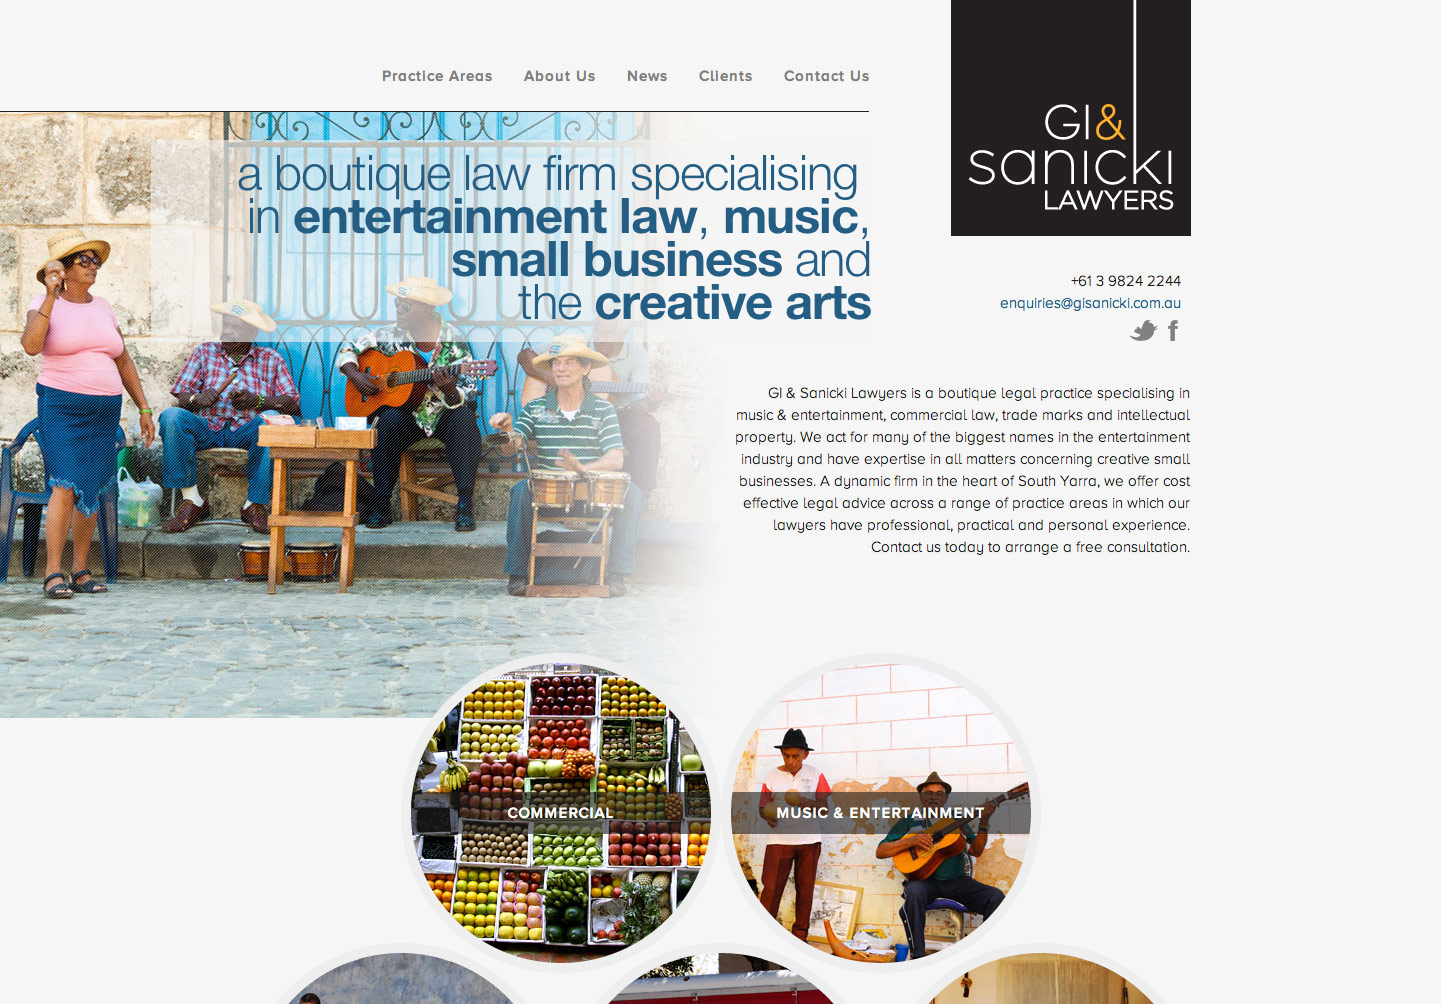 GI & Sanicki Lawyers Website Screenshot